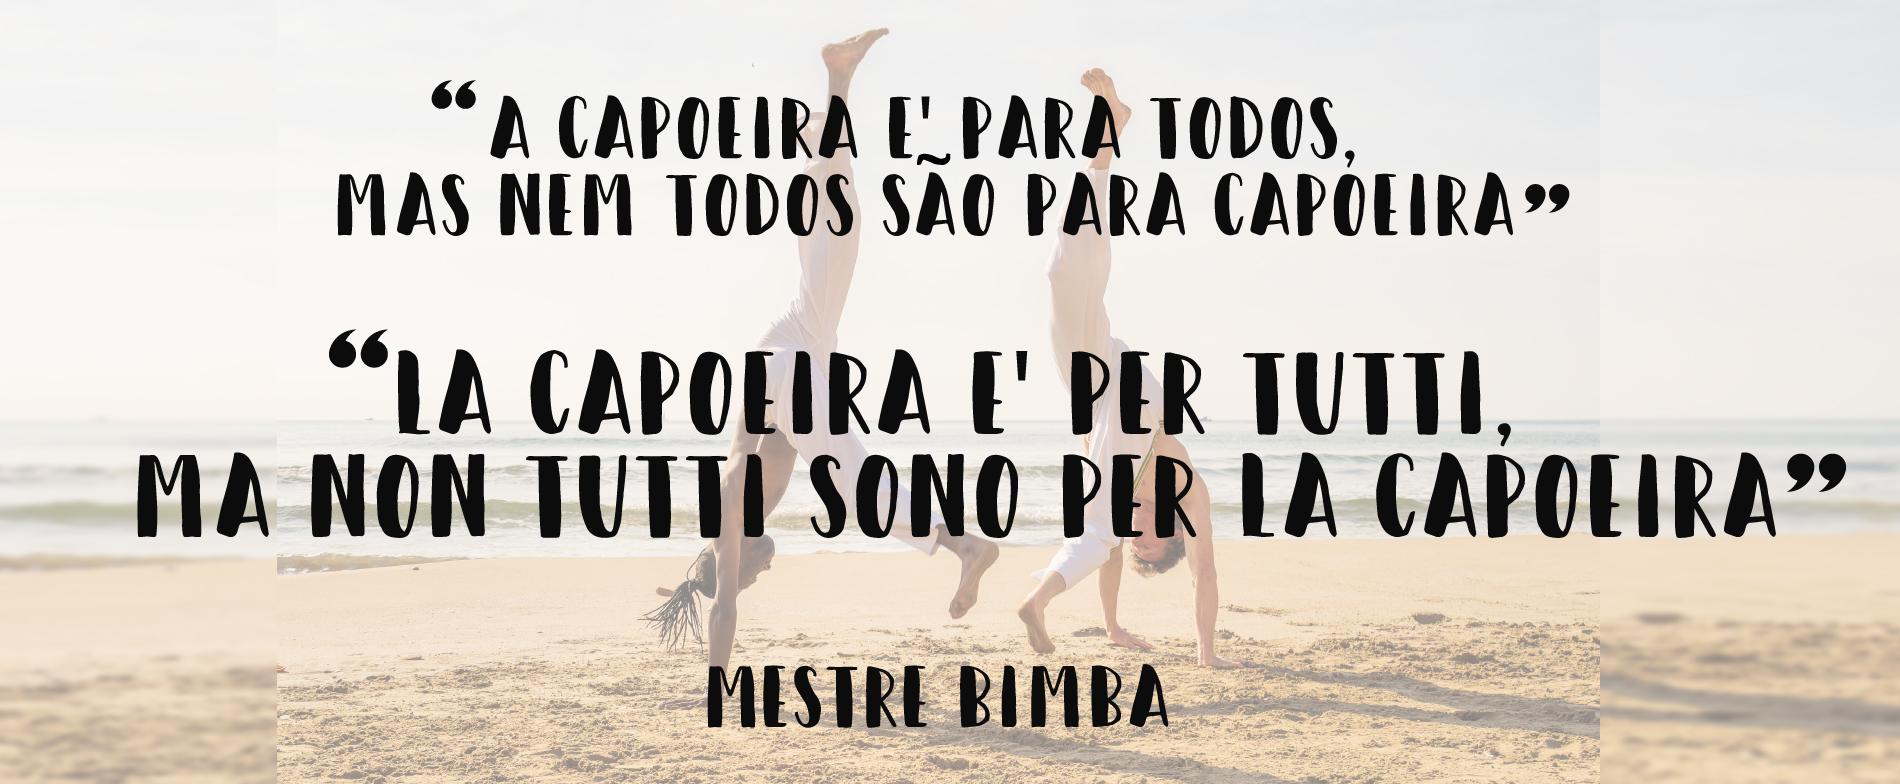 capoeira: frase del Mestre Bimba